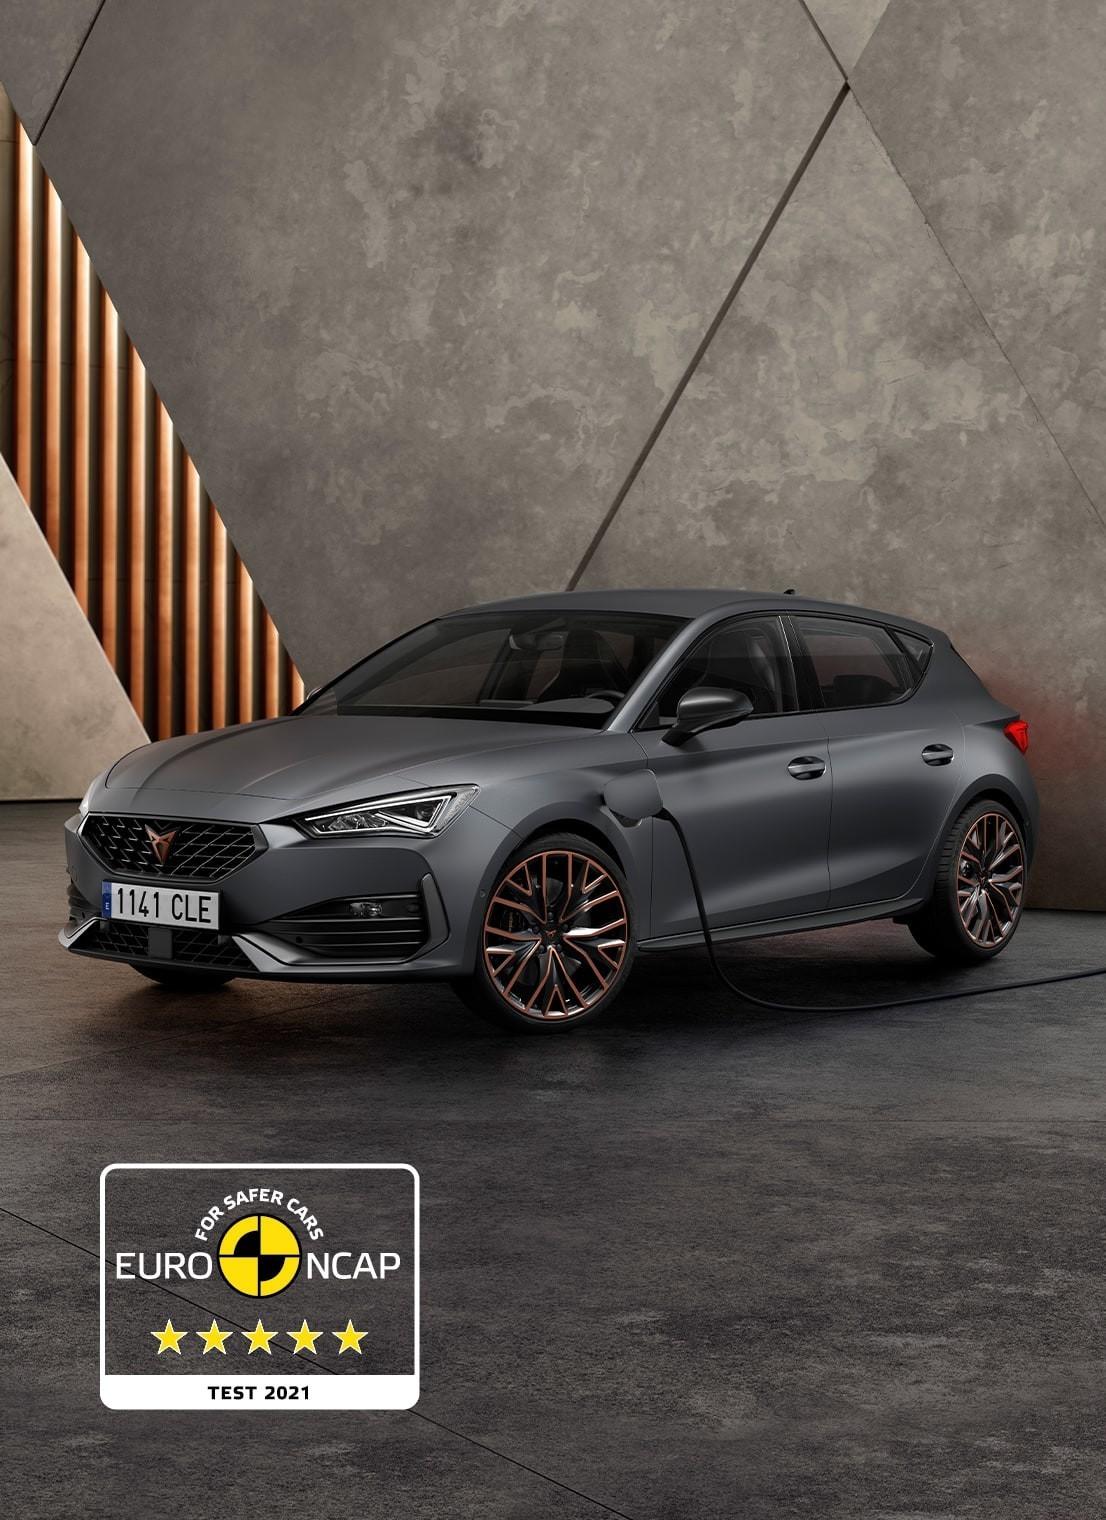 cupra-leon-5-door-ehybrid-compact-car-ranking-euroncap.jpg